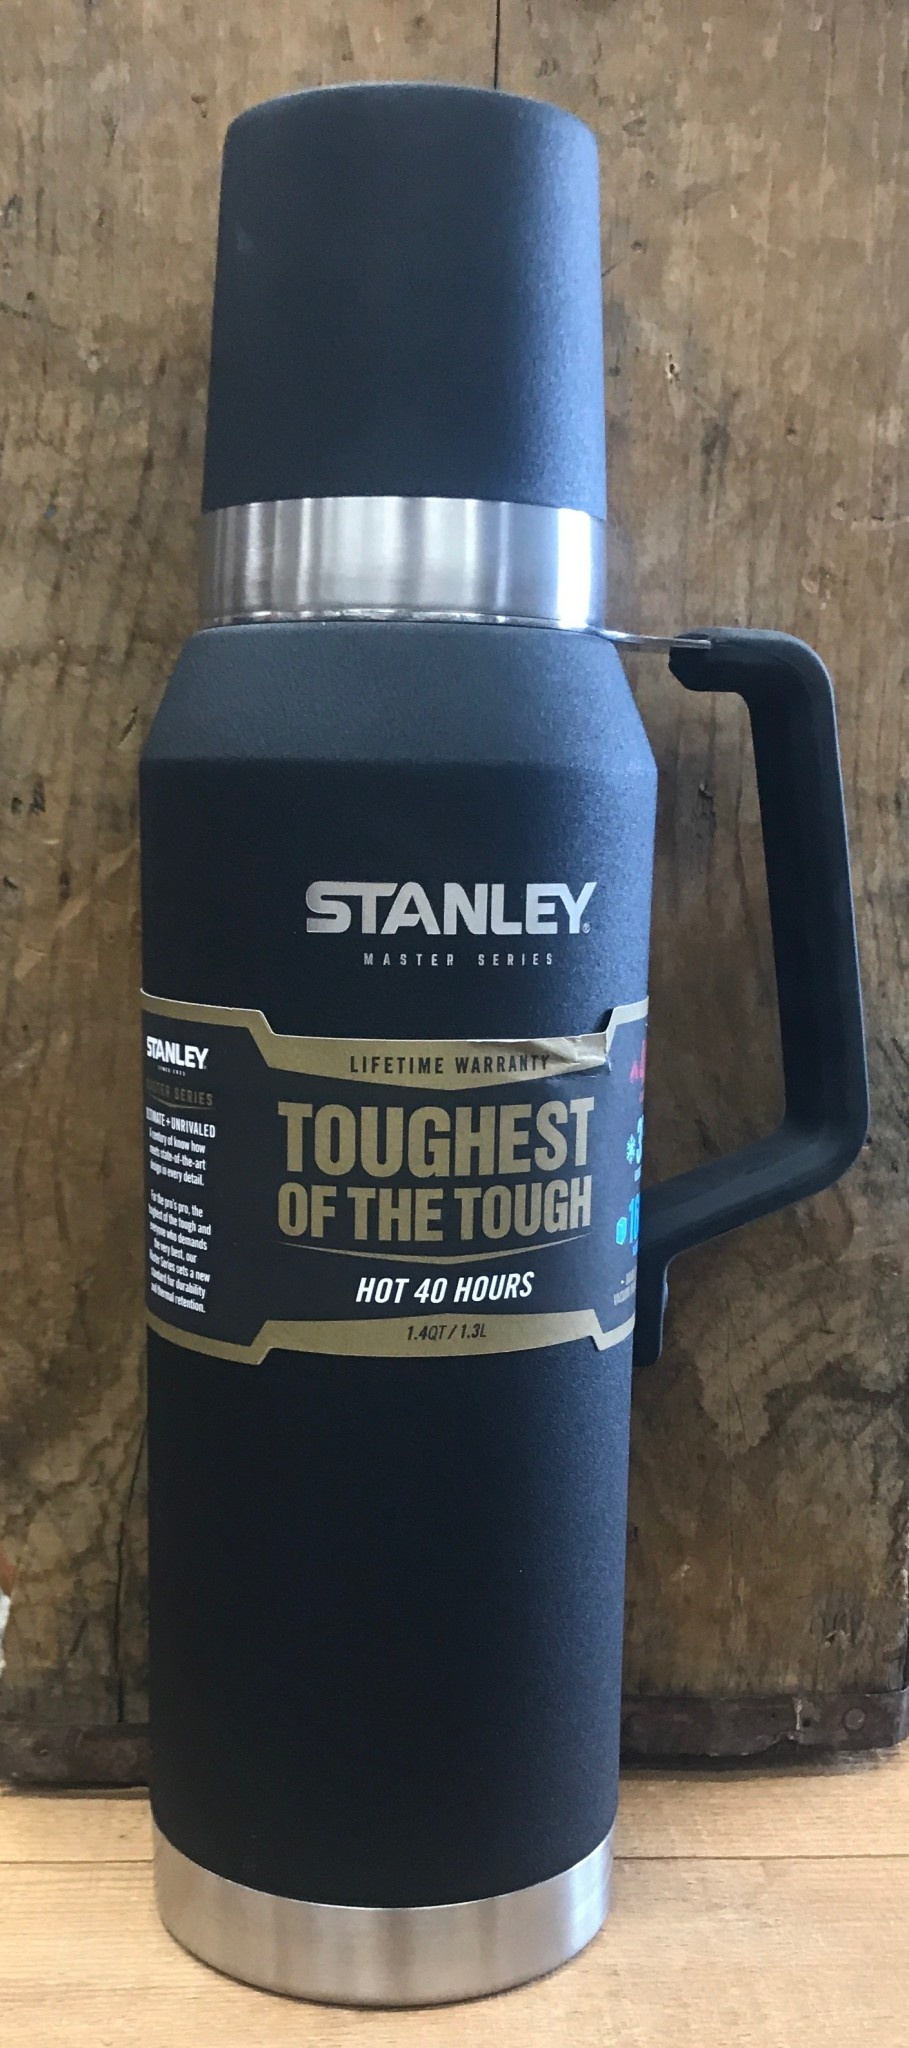 Stanley Classic Master Bottle Black 40% Off!!